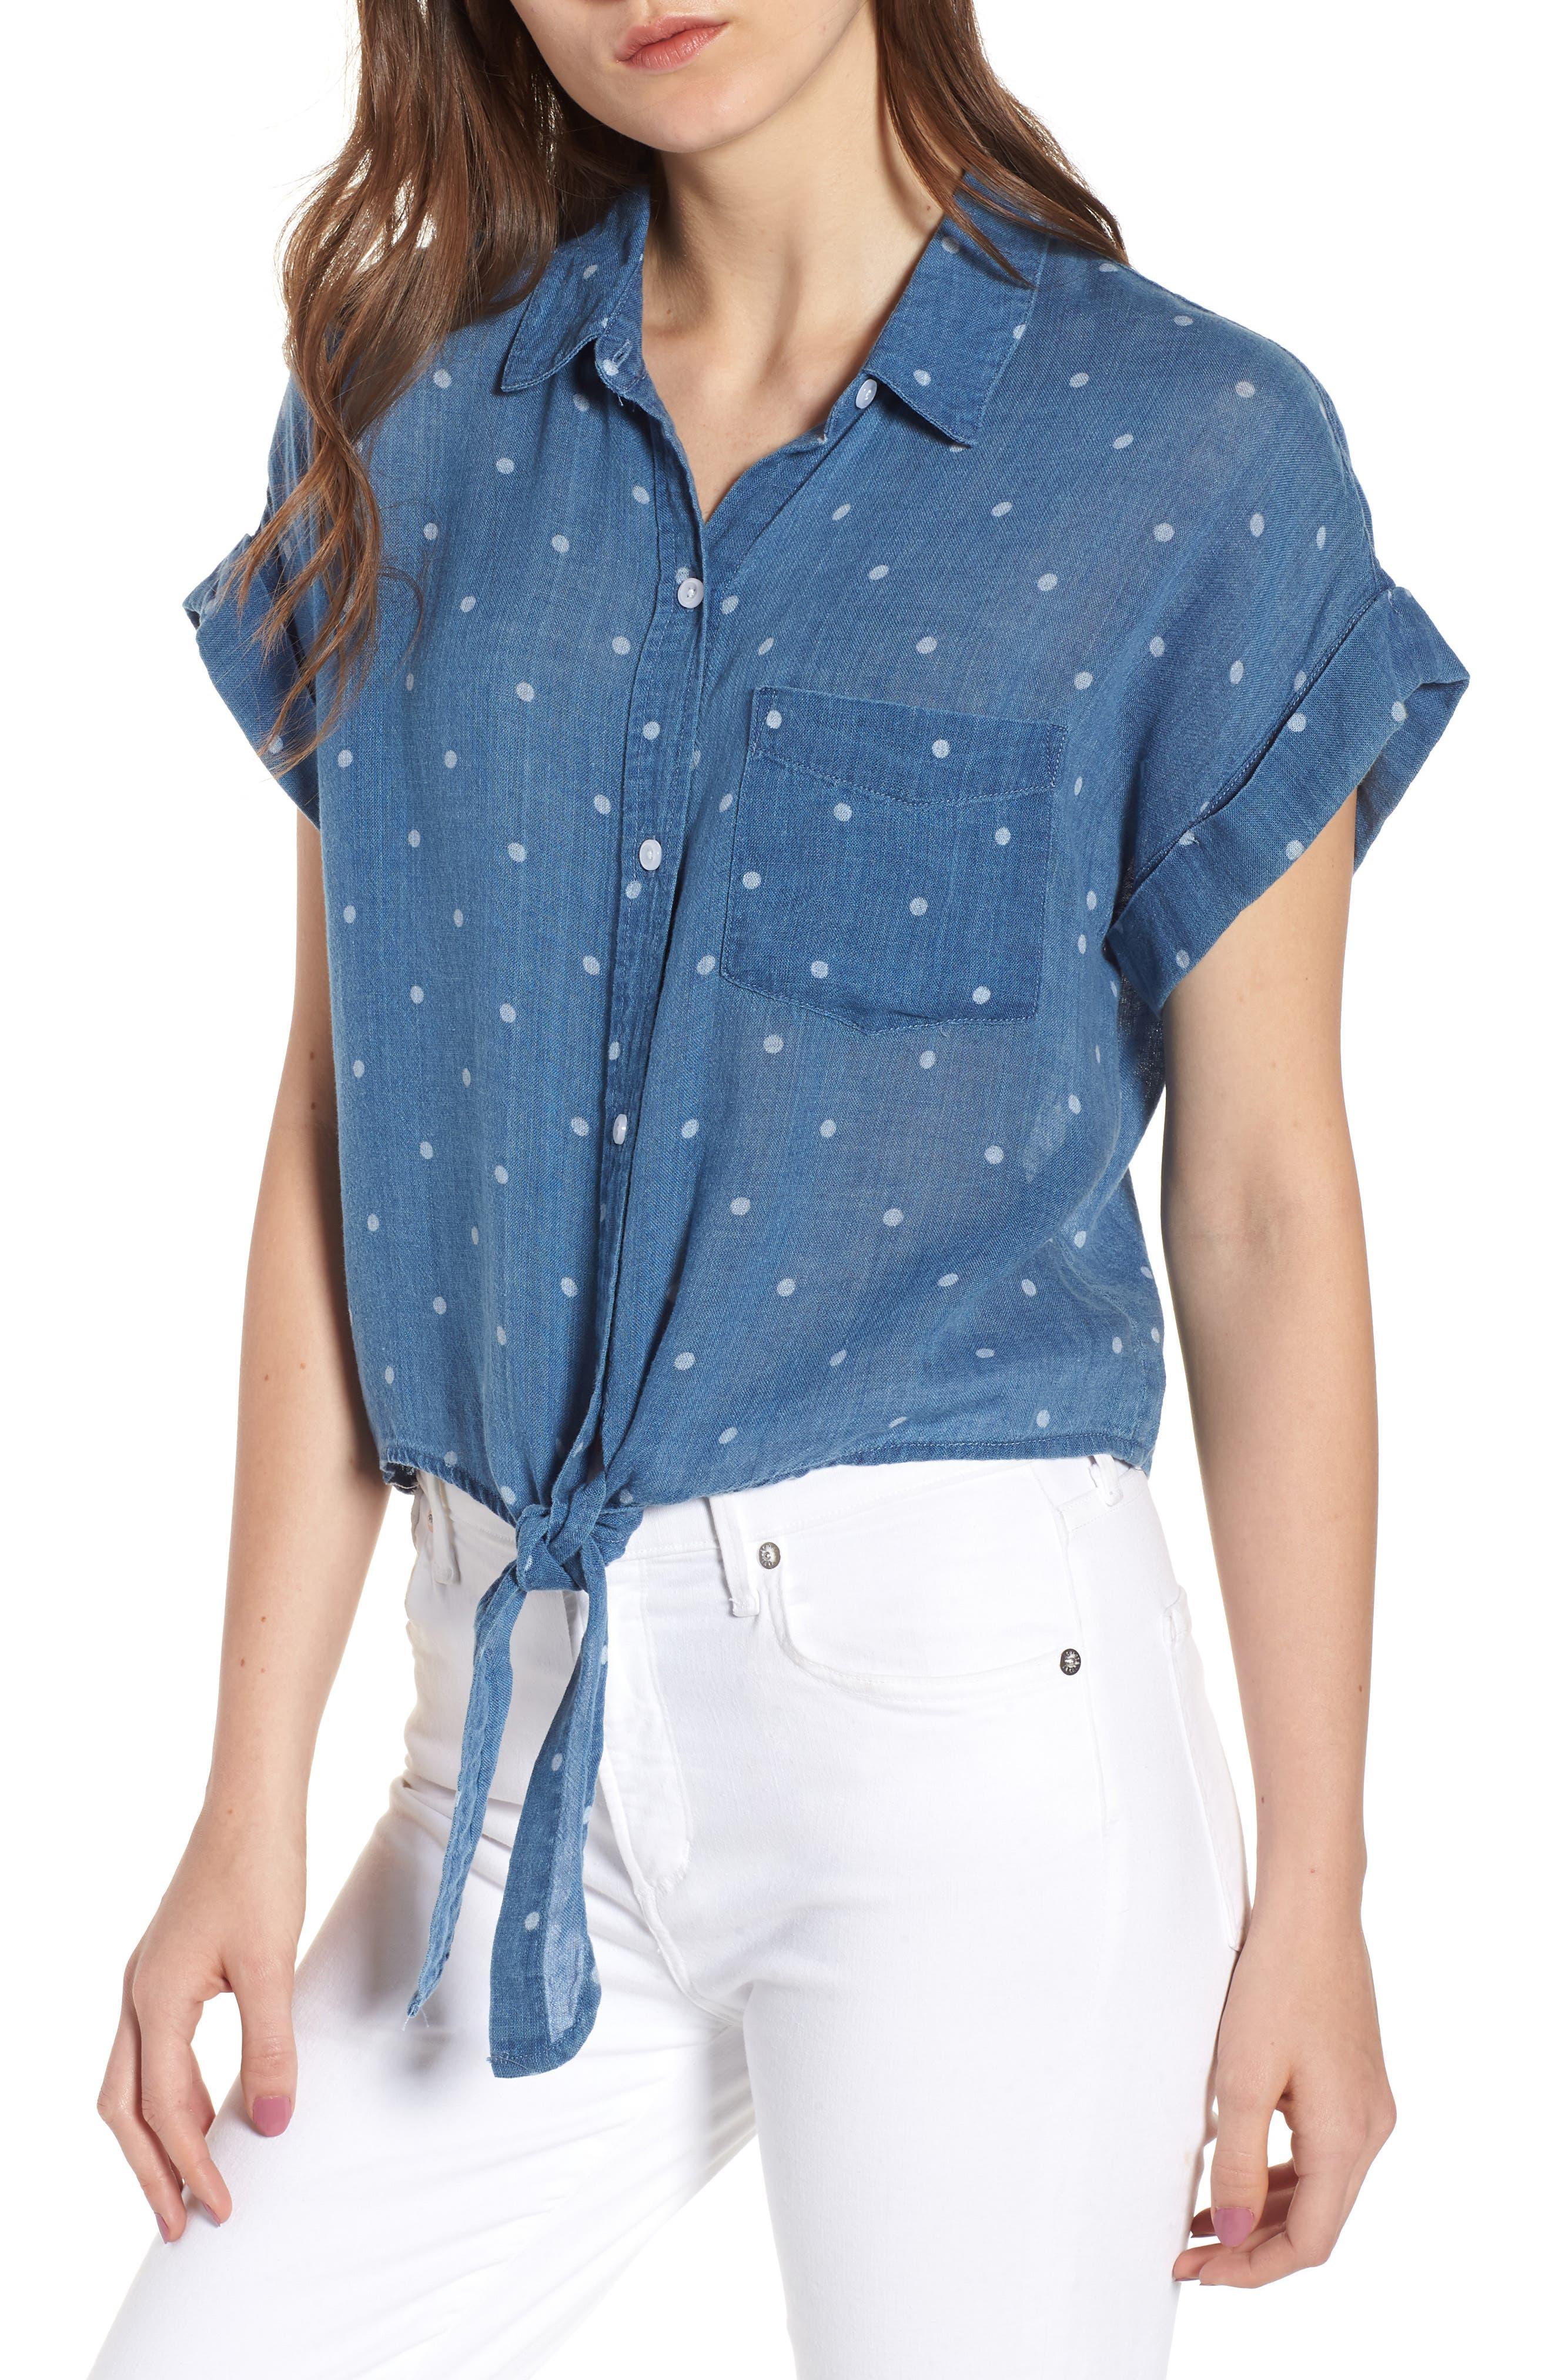 Amelie Tie Front Shirt,                             Main thumbnail 1, color,                             INDIGO WHITE POLKA DOTS